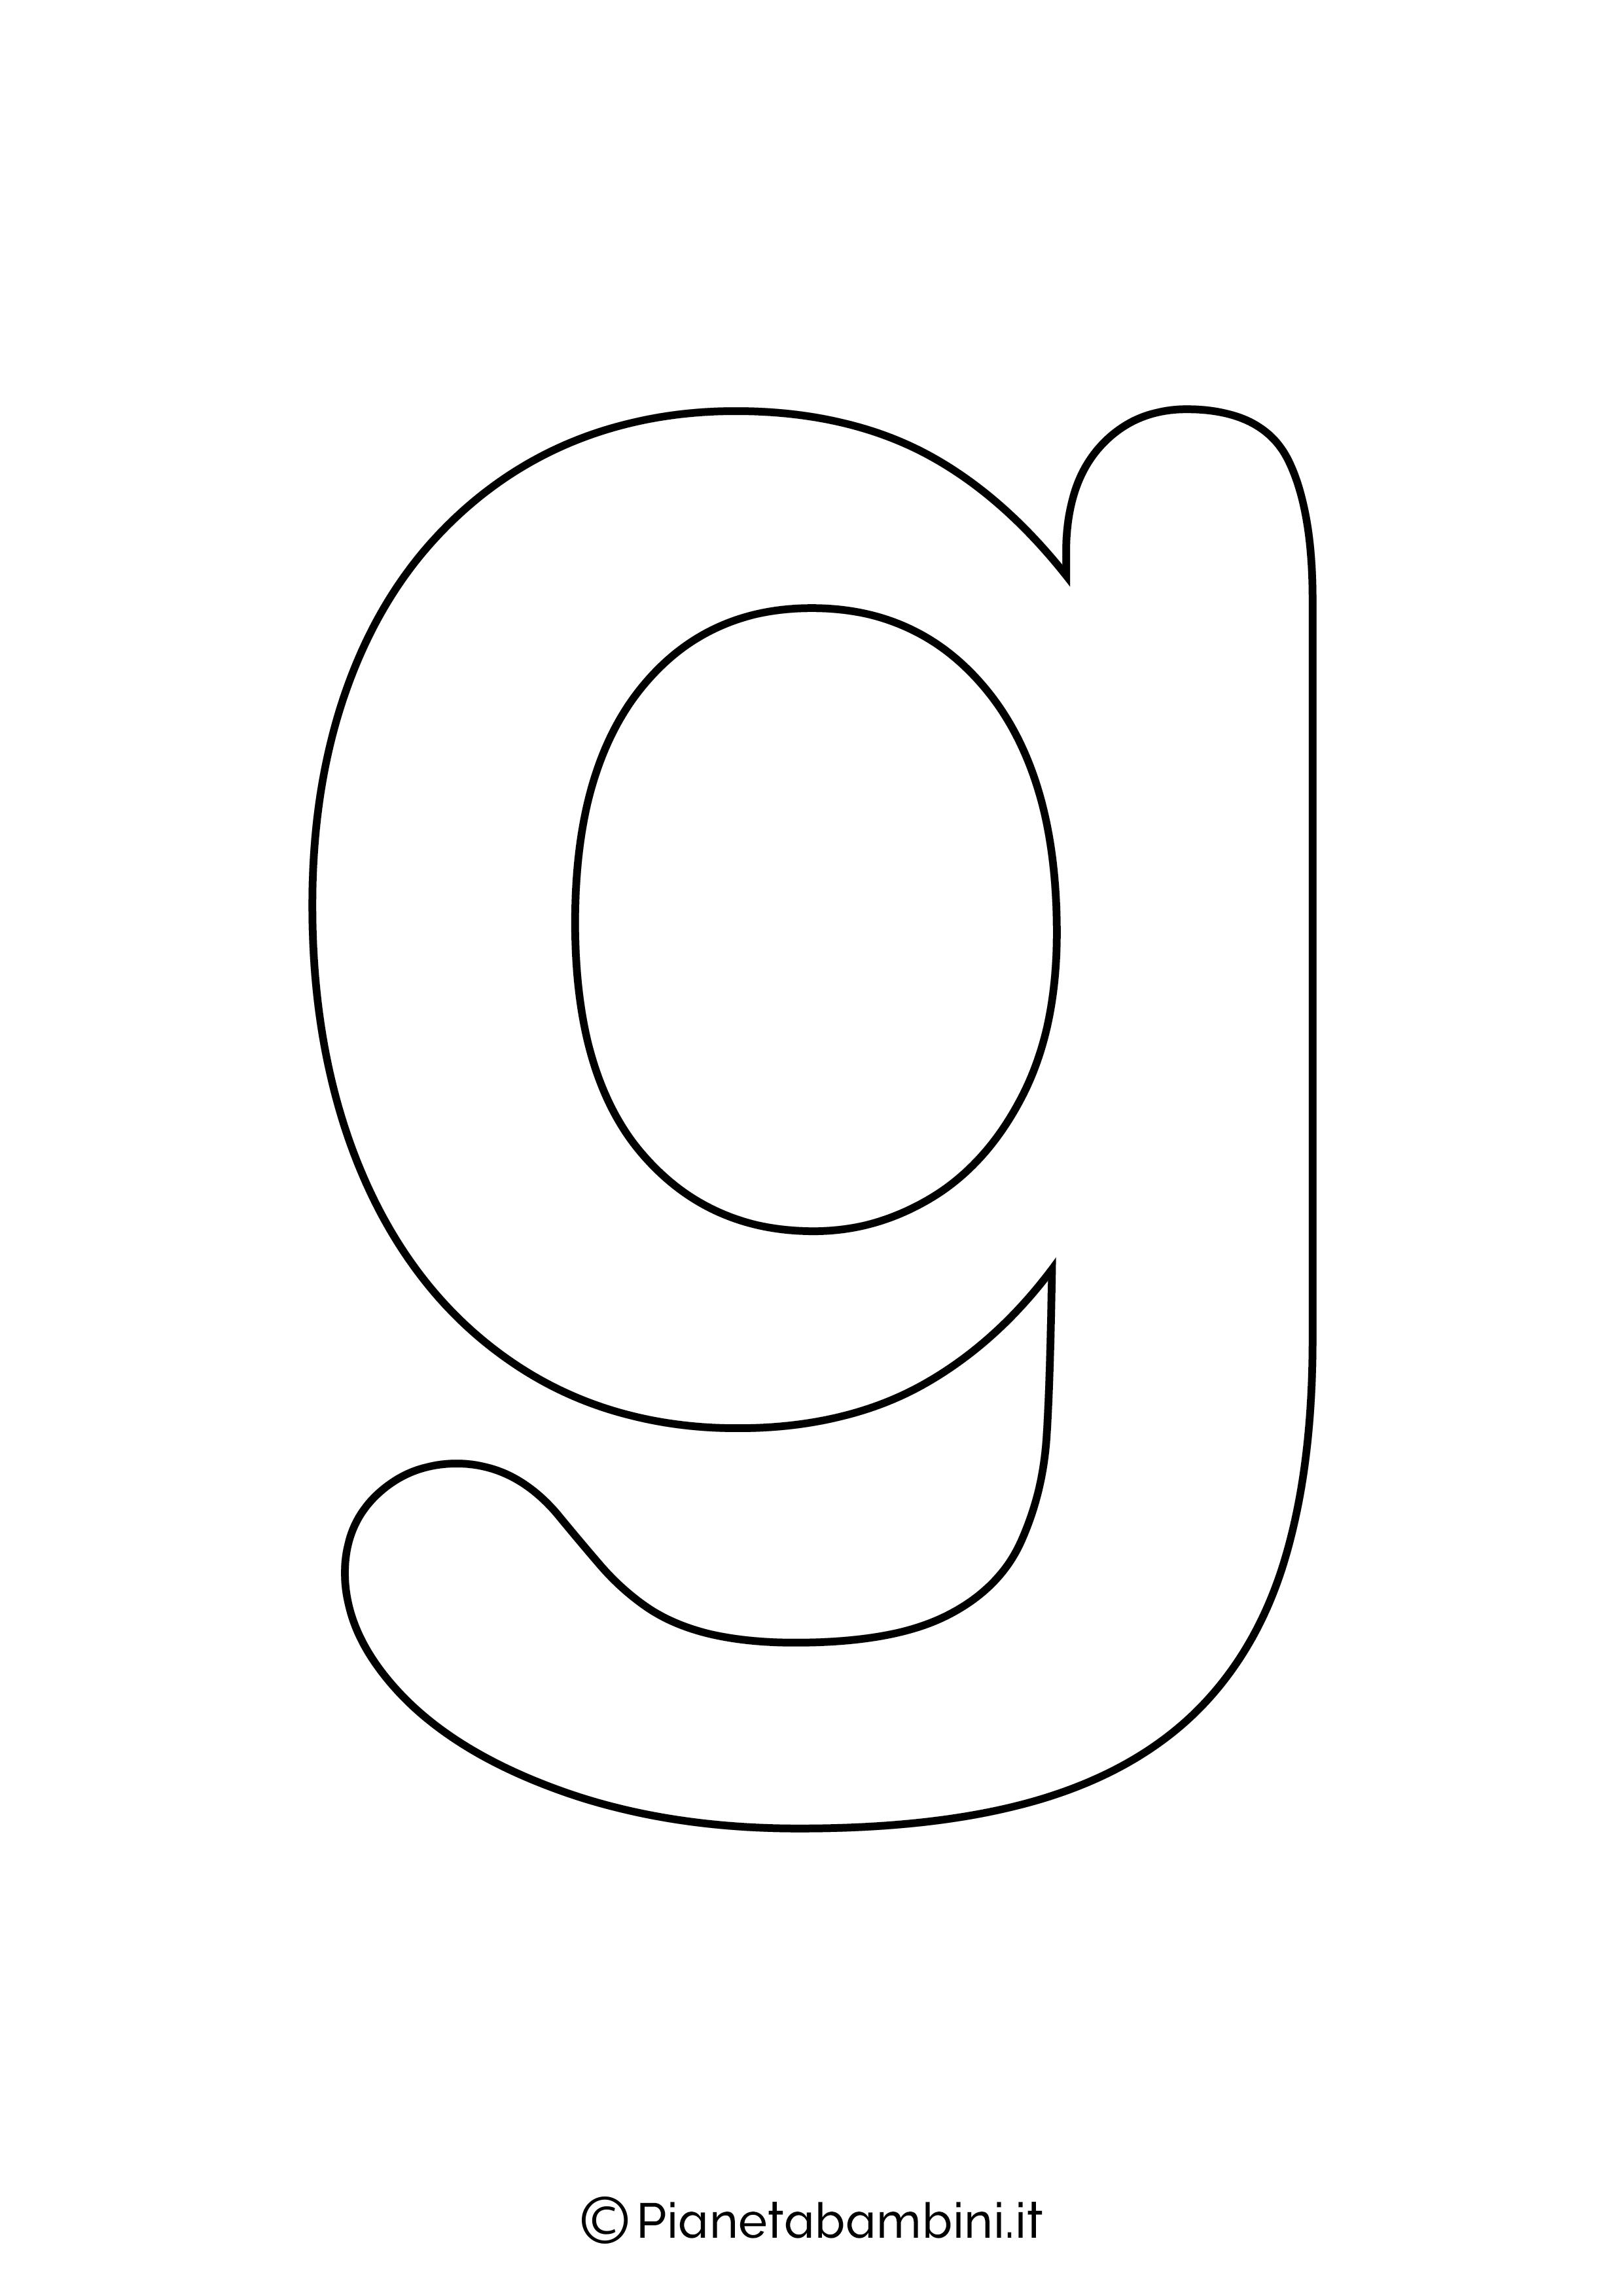 Lettera G minuscola da stampare